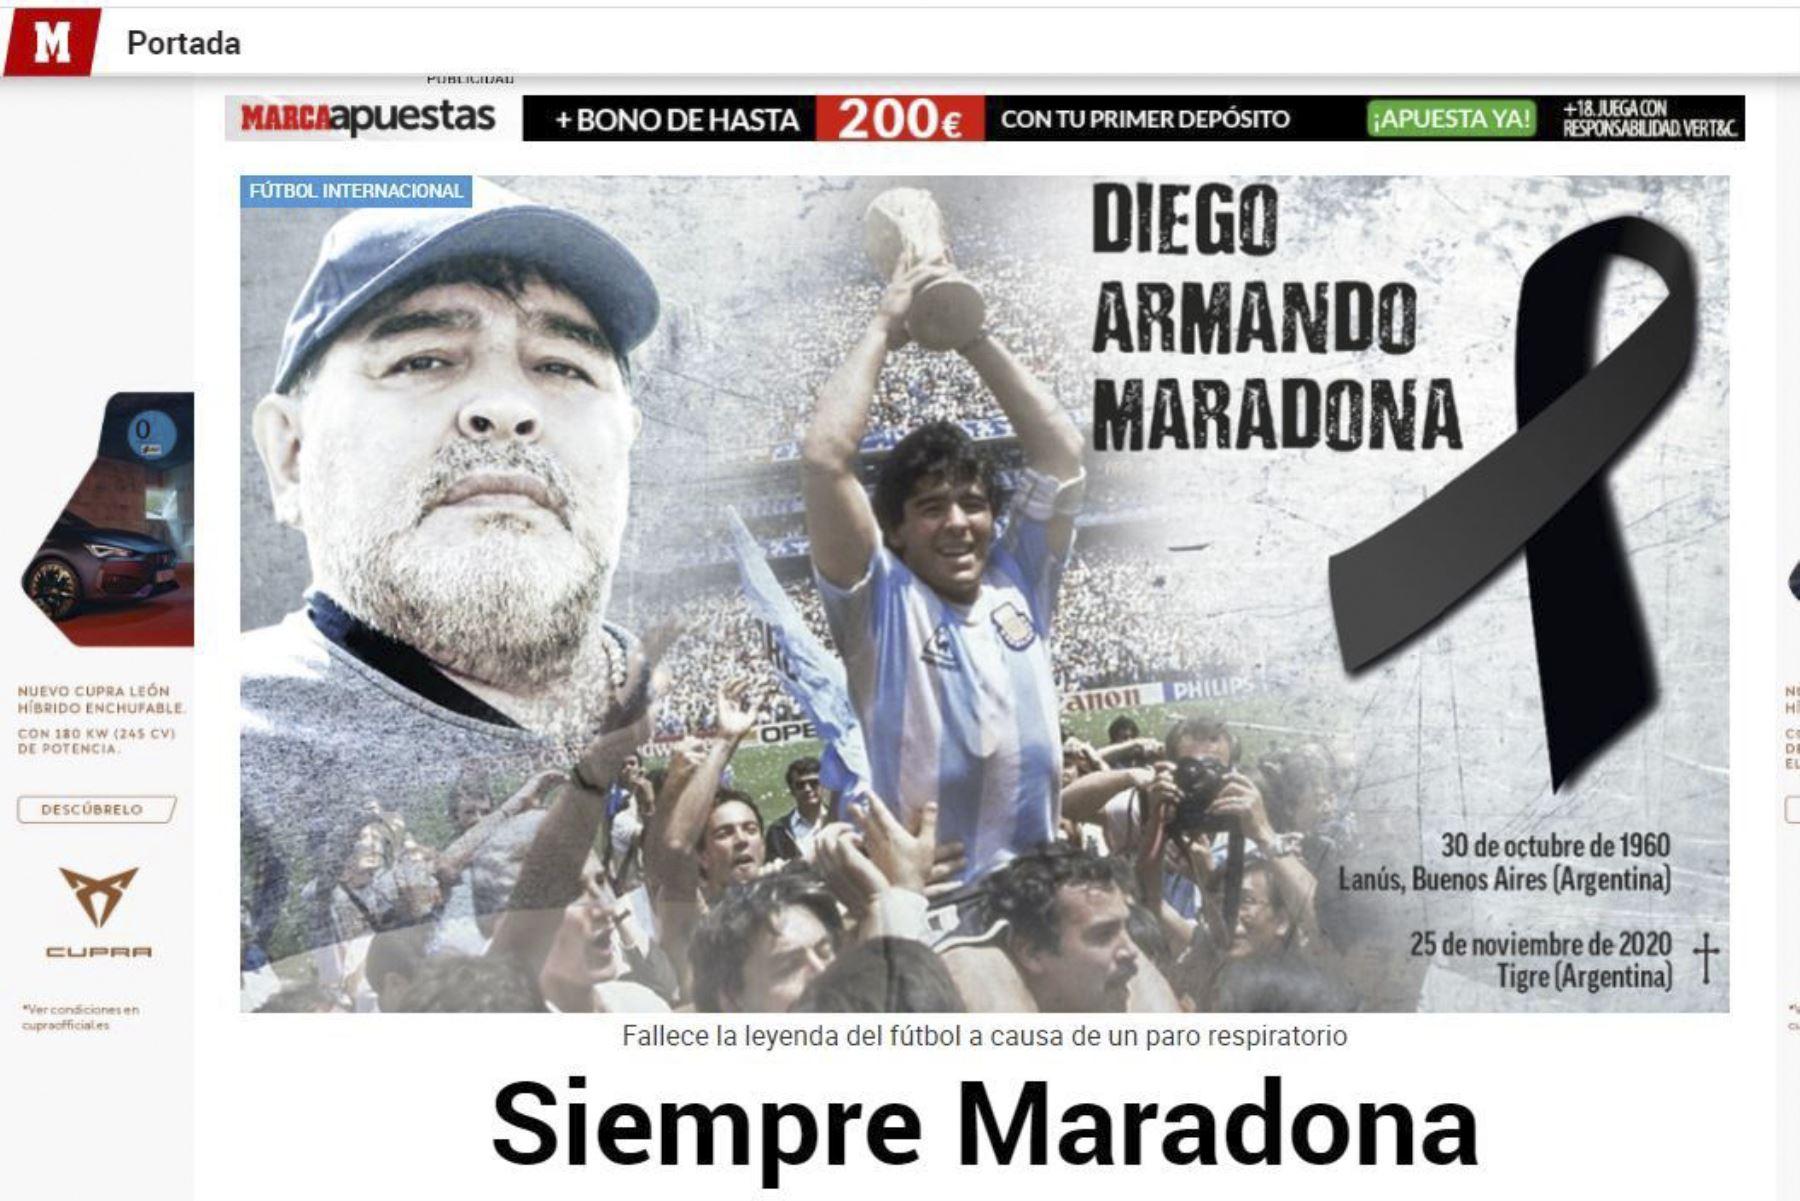 Así informa la prensa mundial la muerte de Diego Armando Maradona. Marca de España